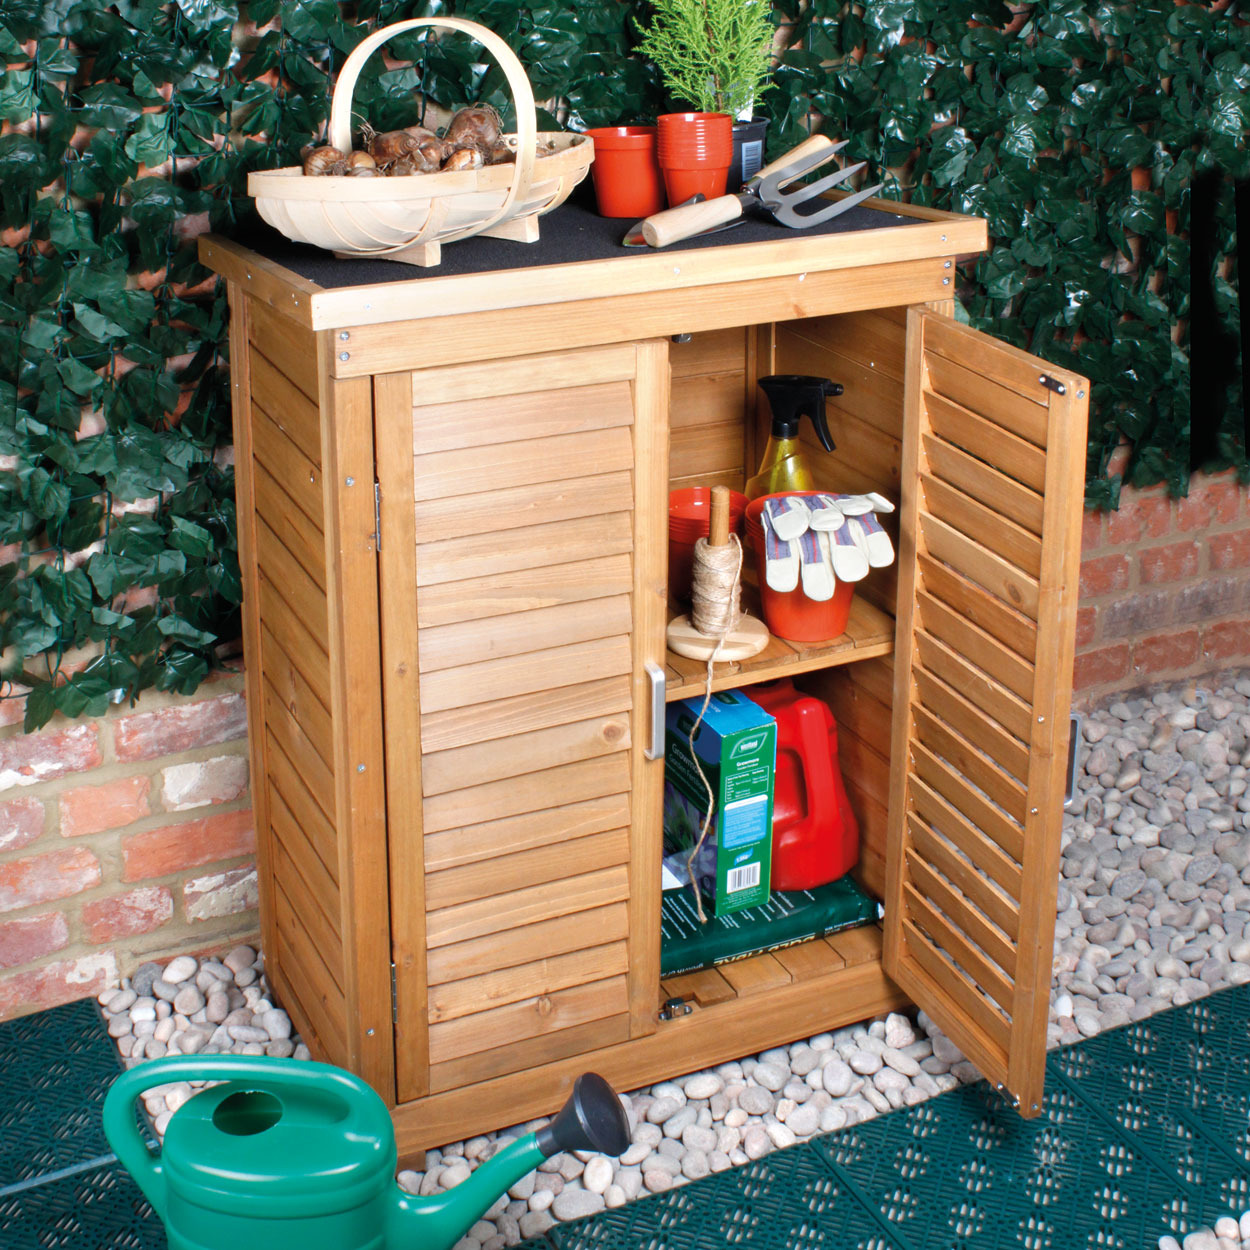 69X96Cm Wooden Cabinet